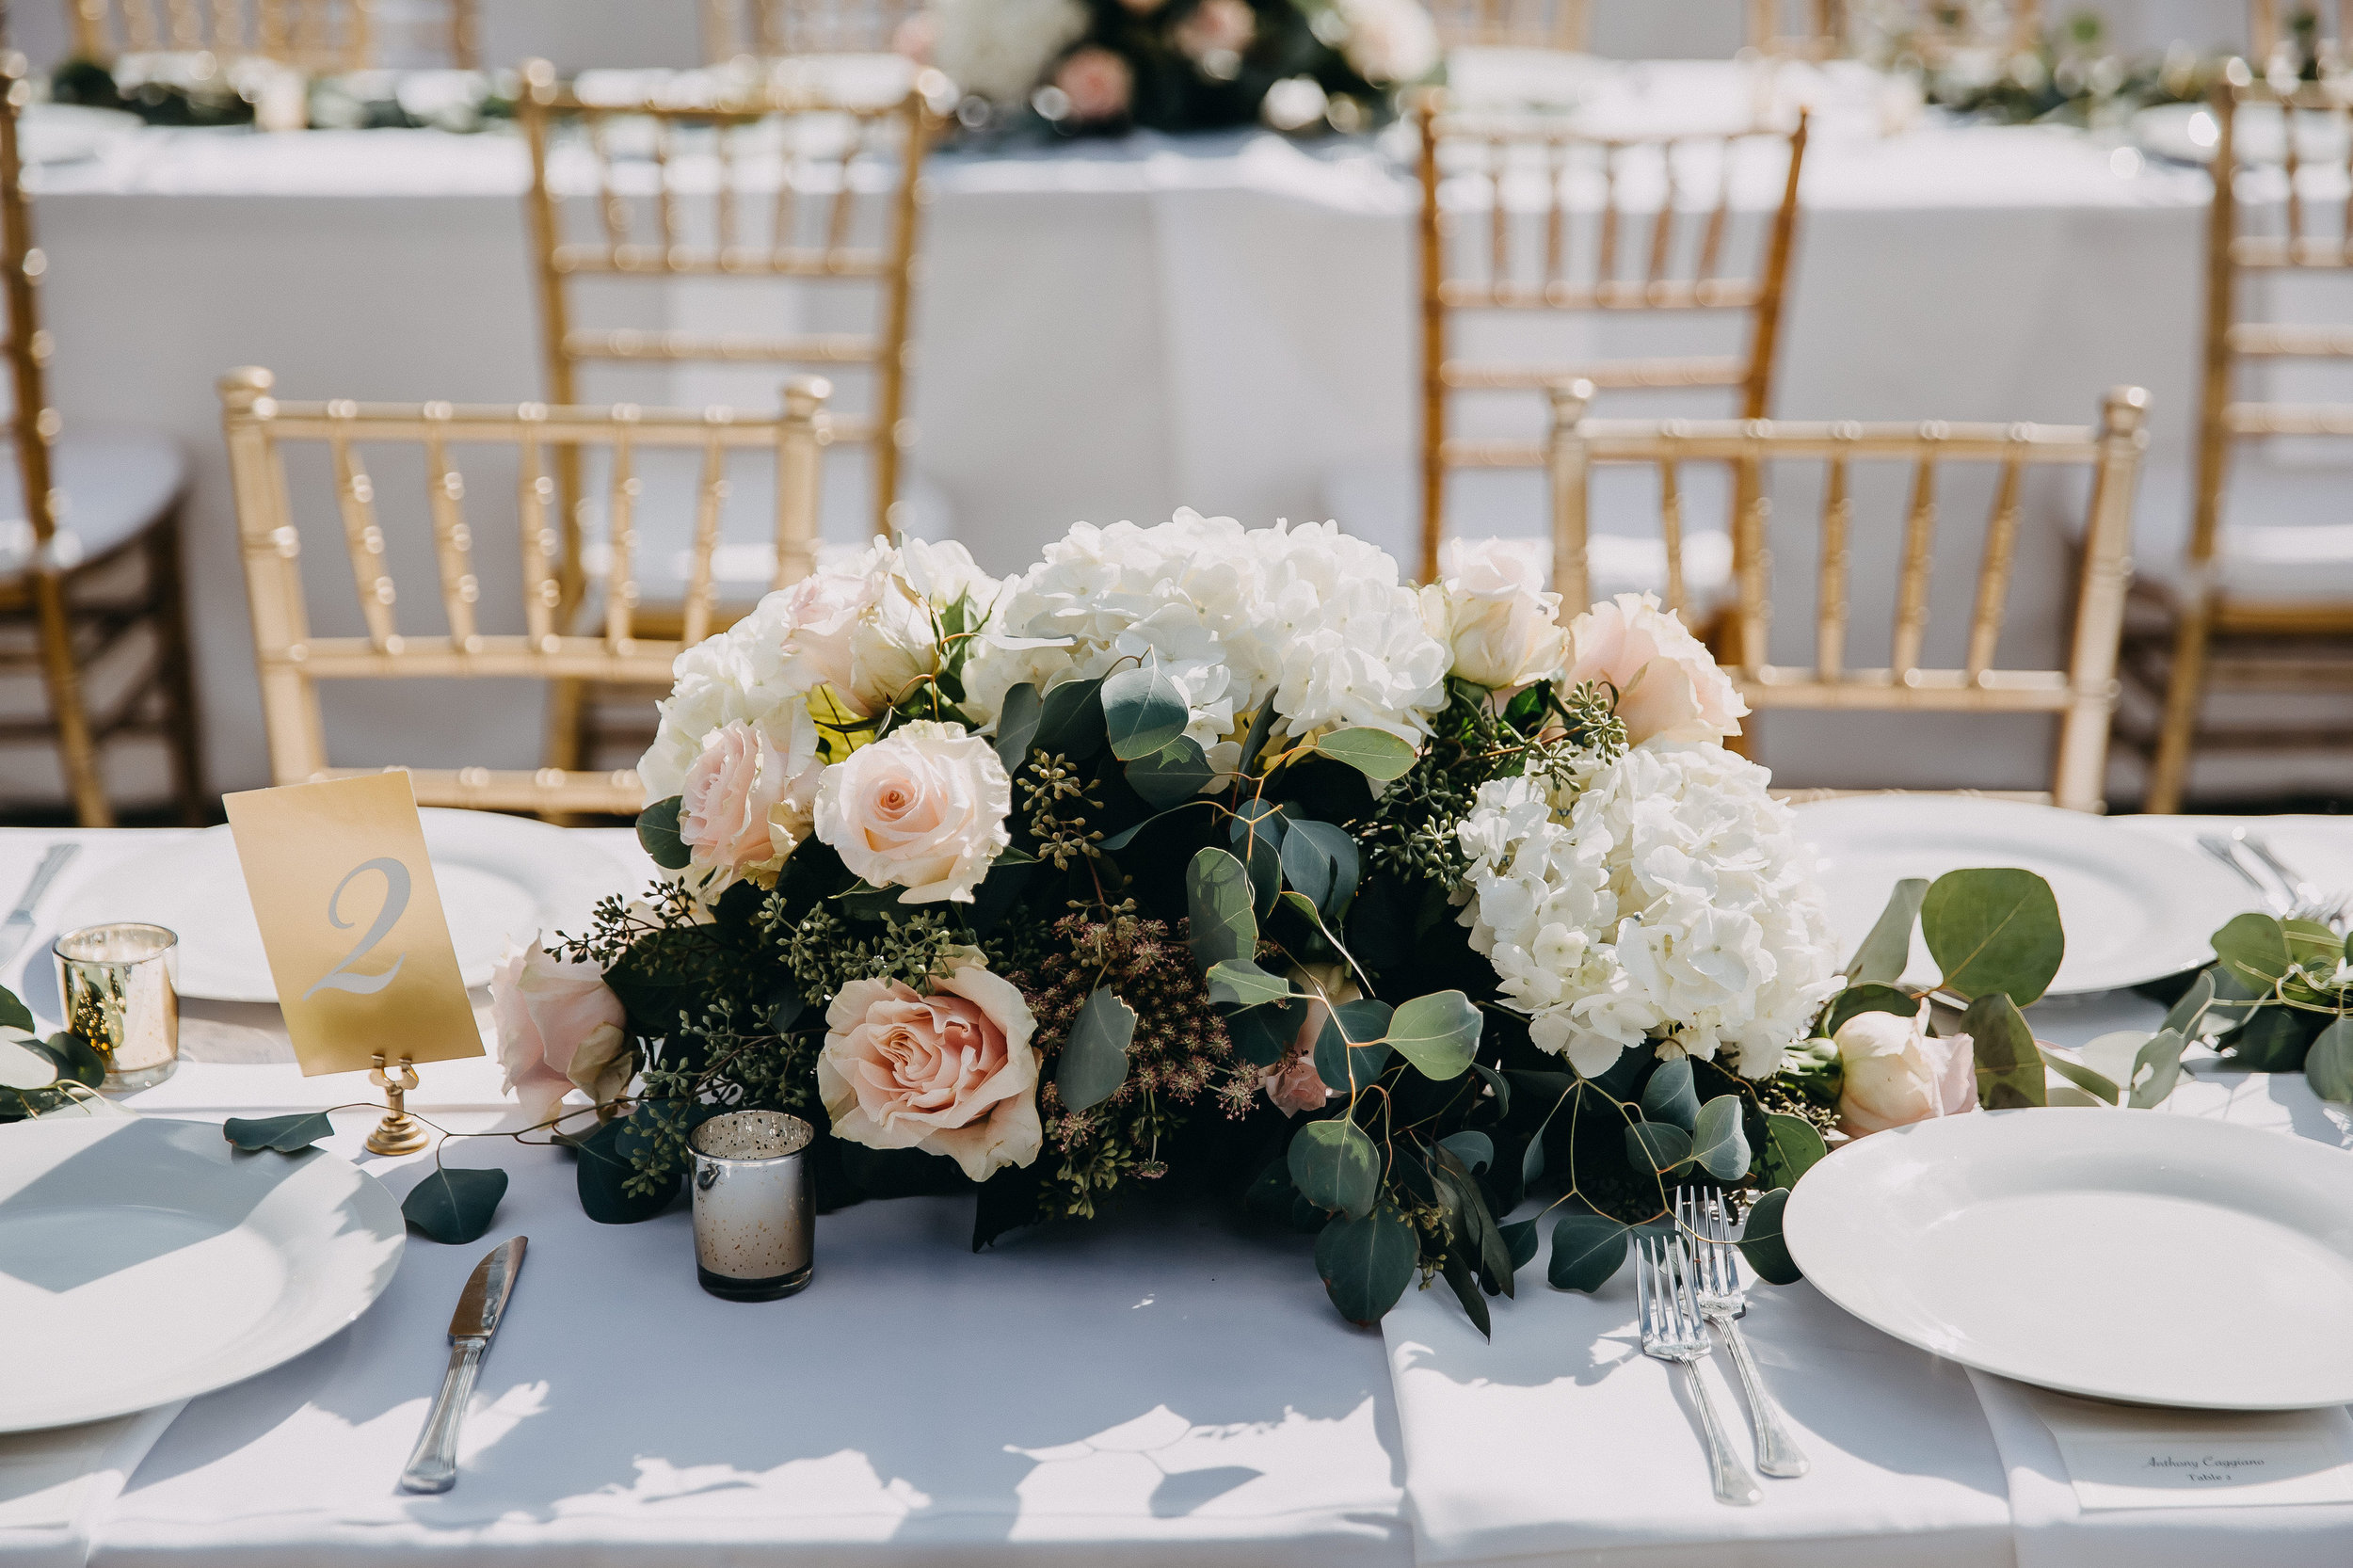 Gorgeous Wedding Centerpieces - Florida Estate Wedding - Powel Crowley Estate Wedding